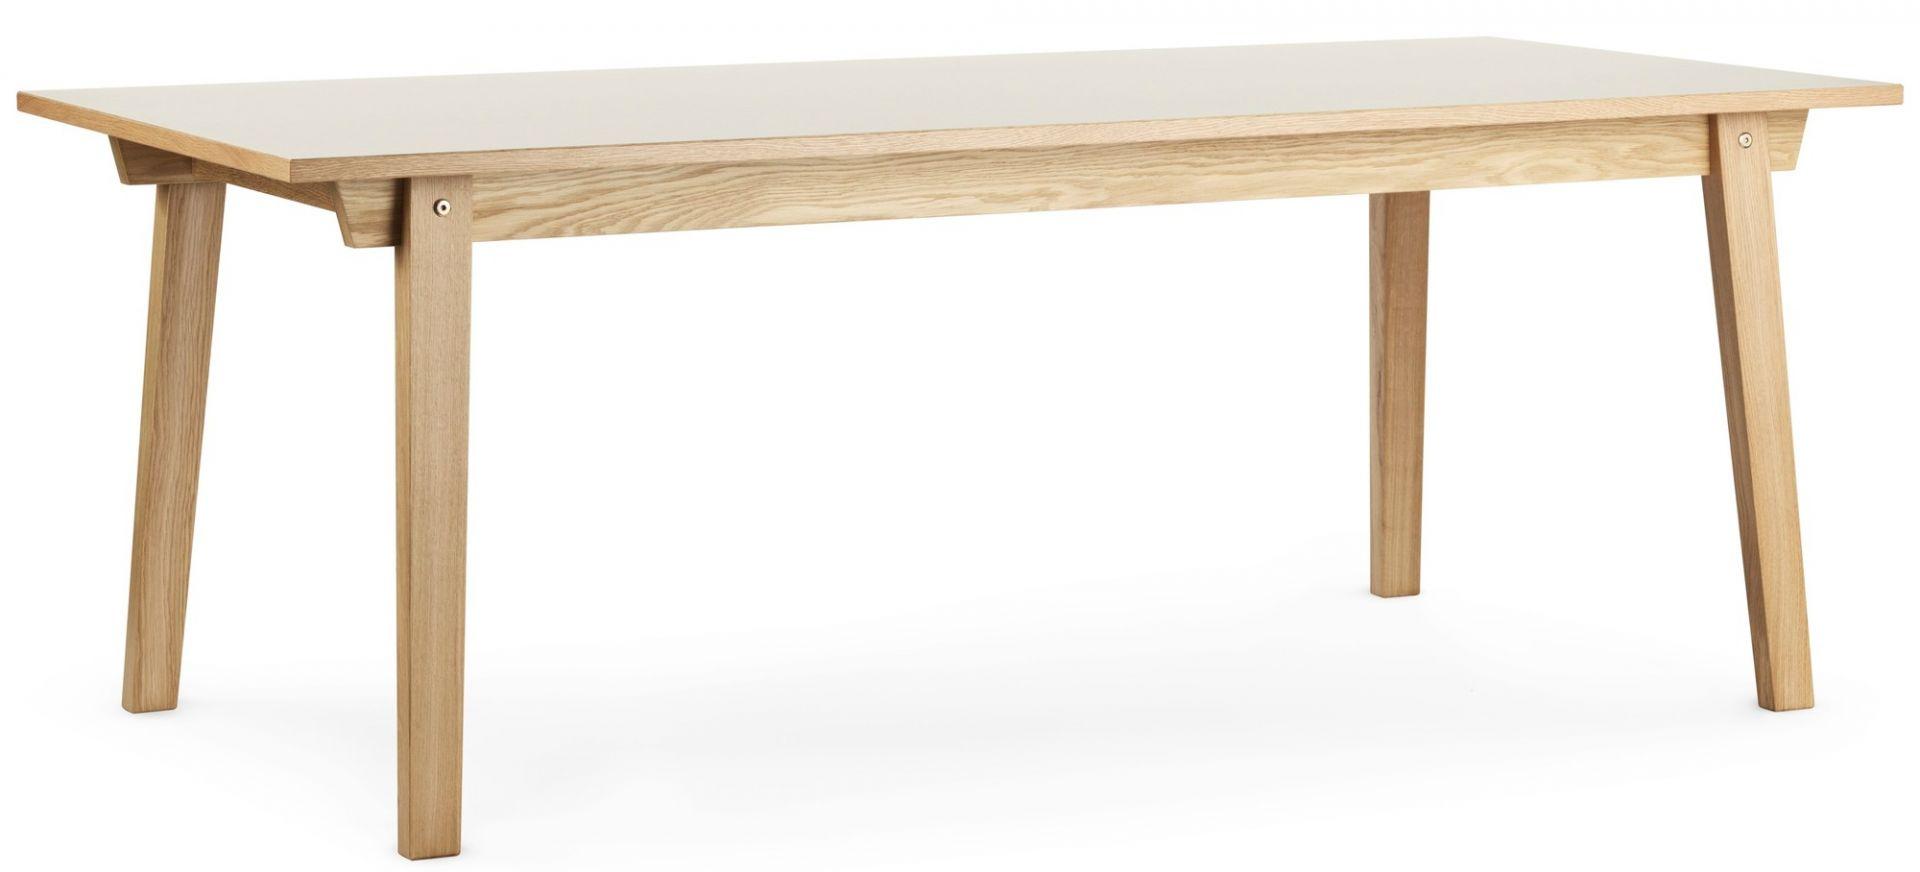 Slice Linoleum Table Tisch Normann Copenhagen-bordeaux